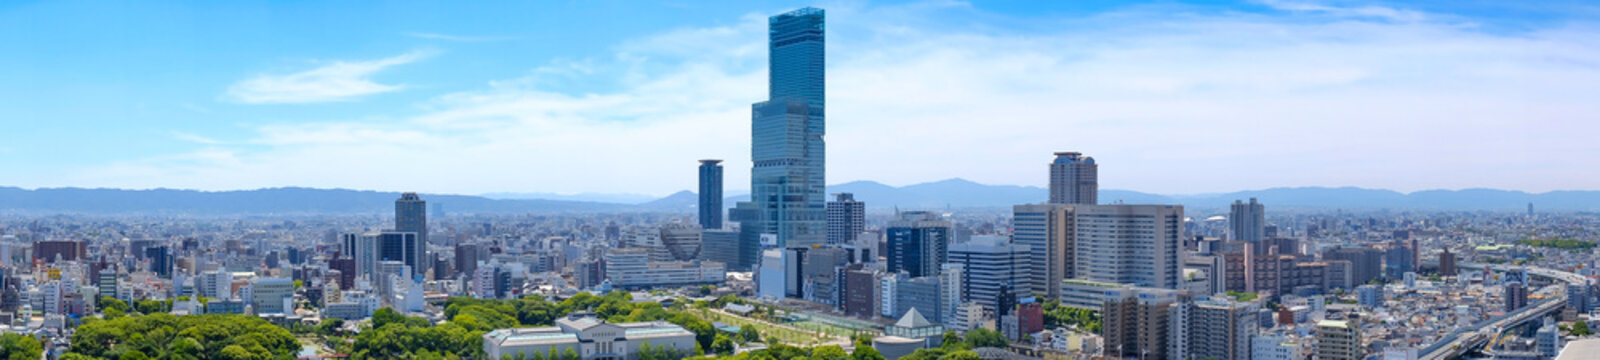 大阪 都市風景 - City view ,Osaka city,Japan.